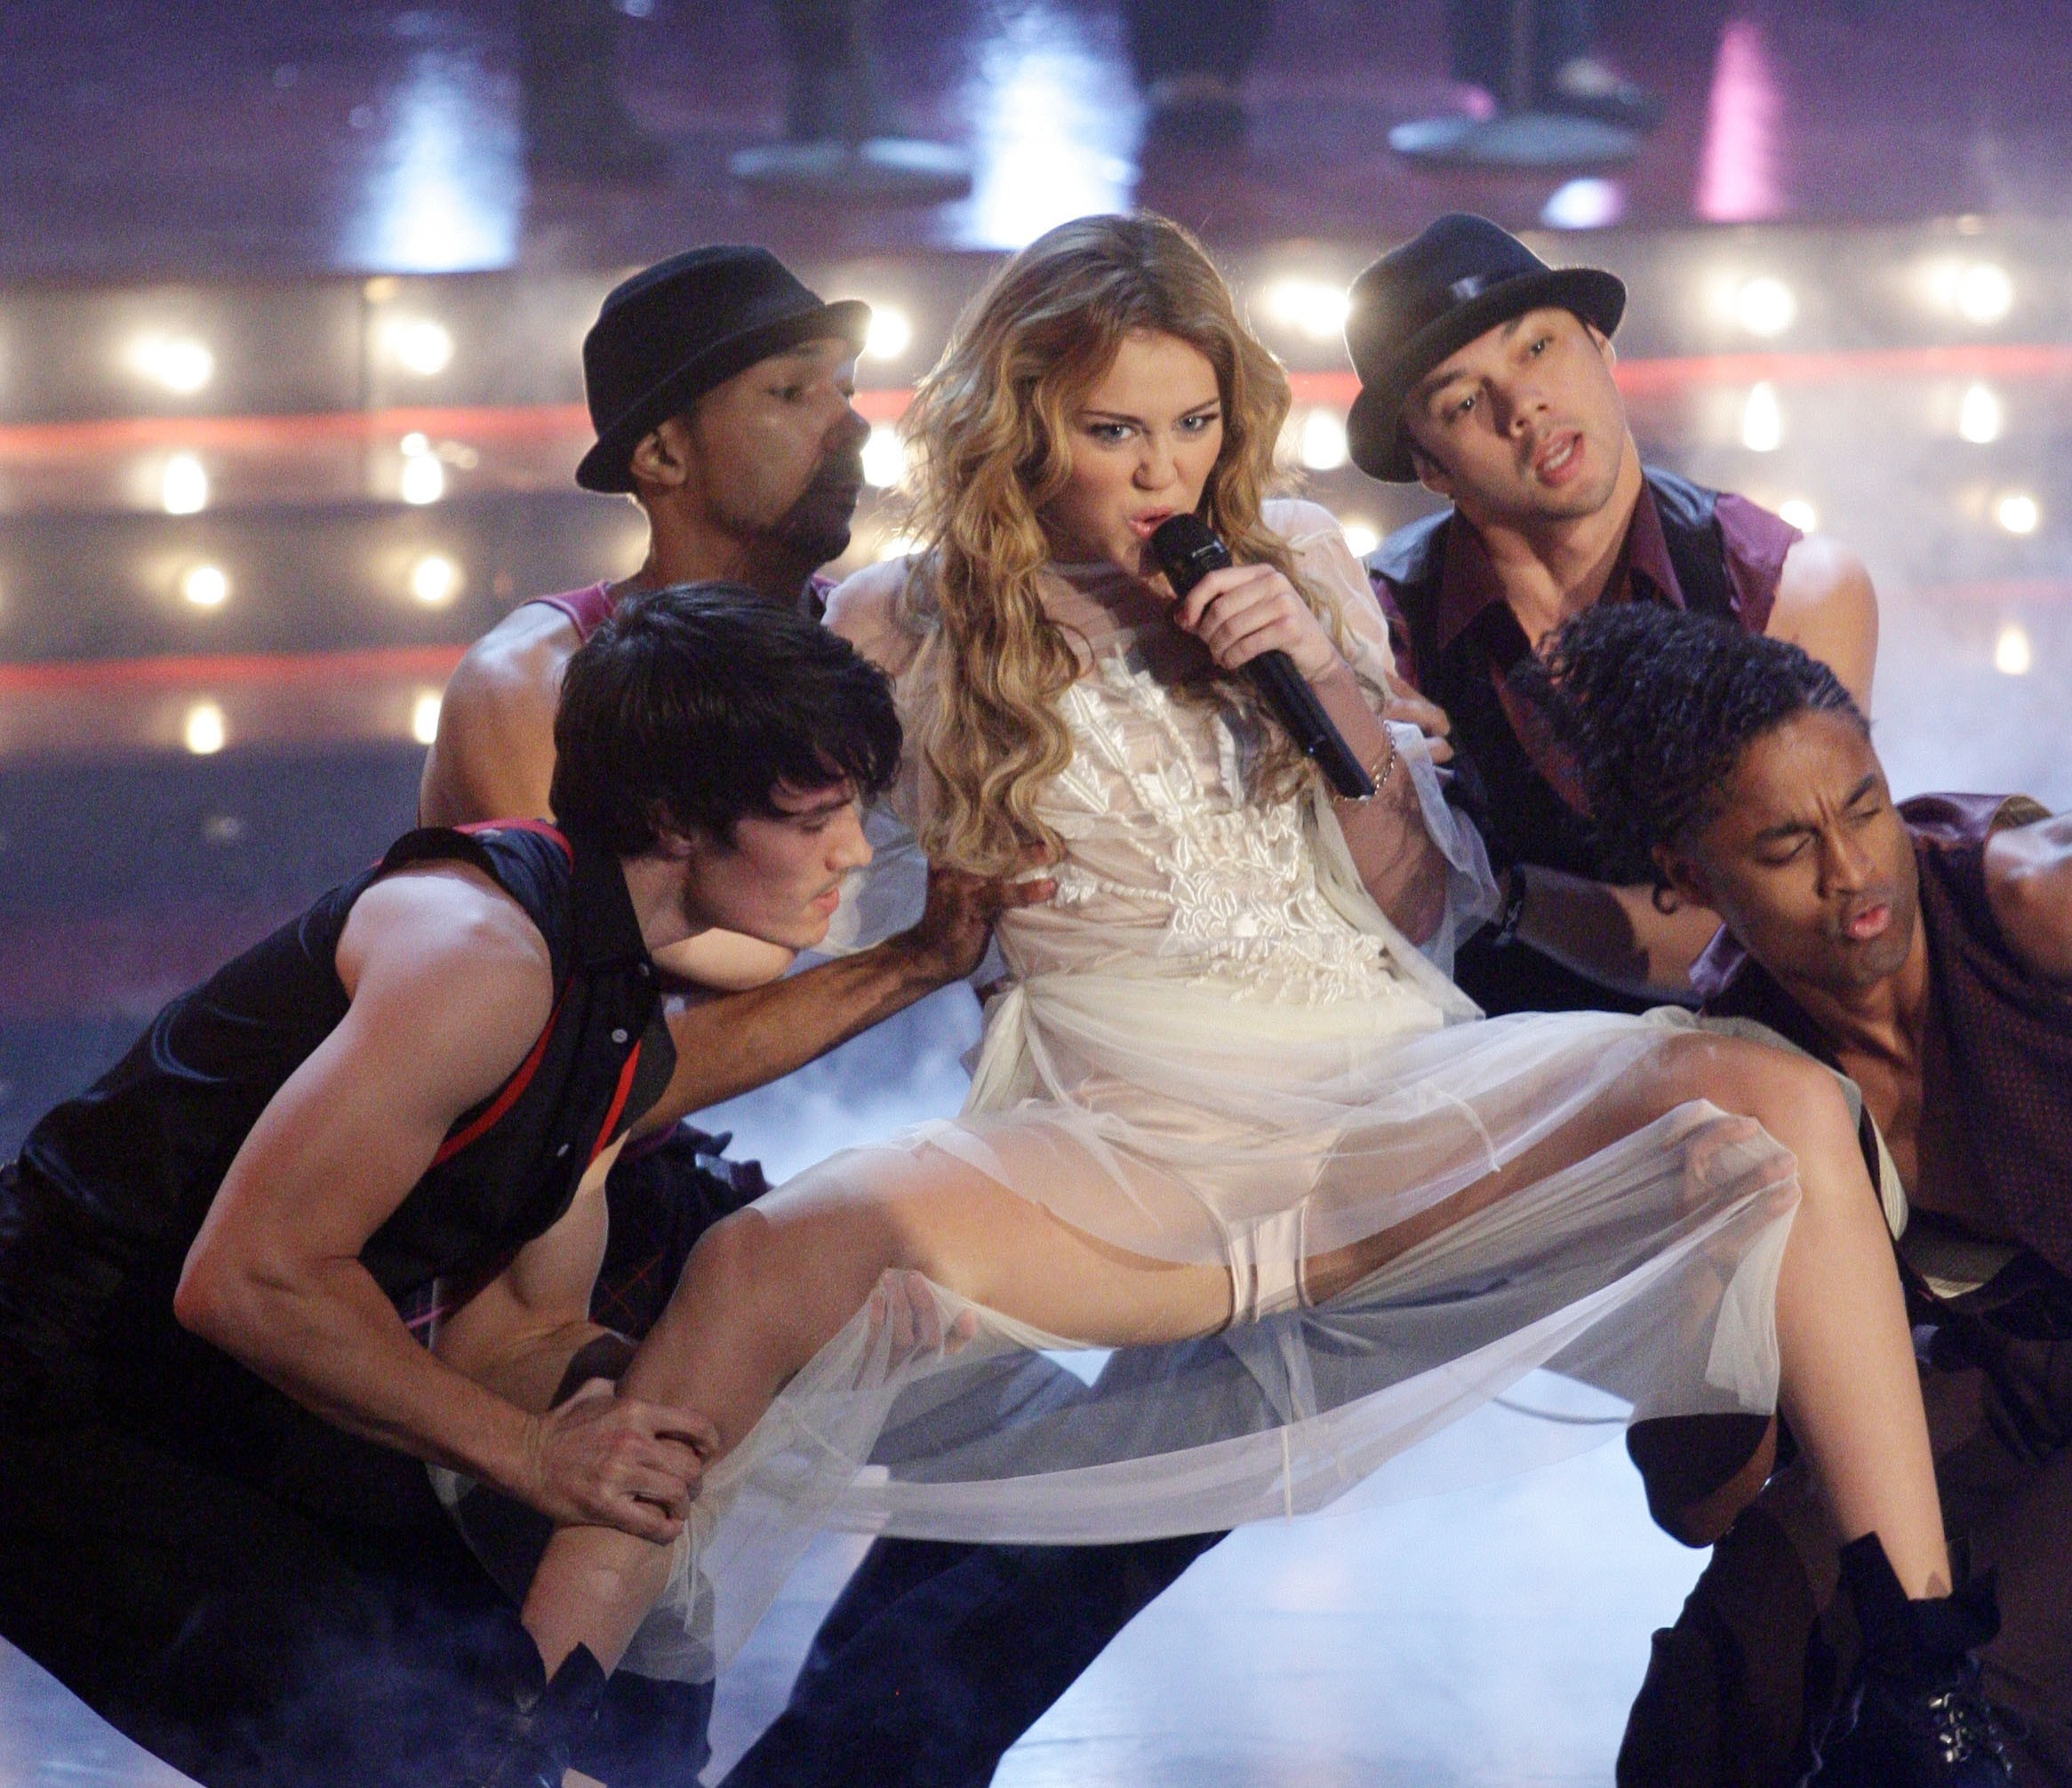 Miley Cyrus Spreading Legs